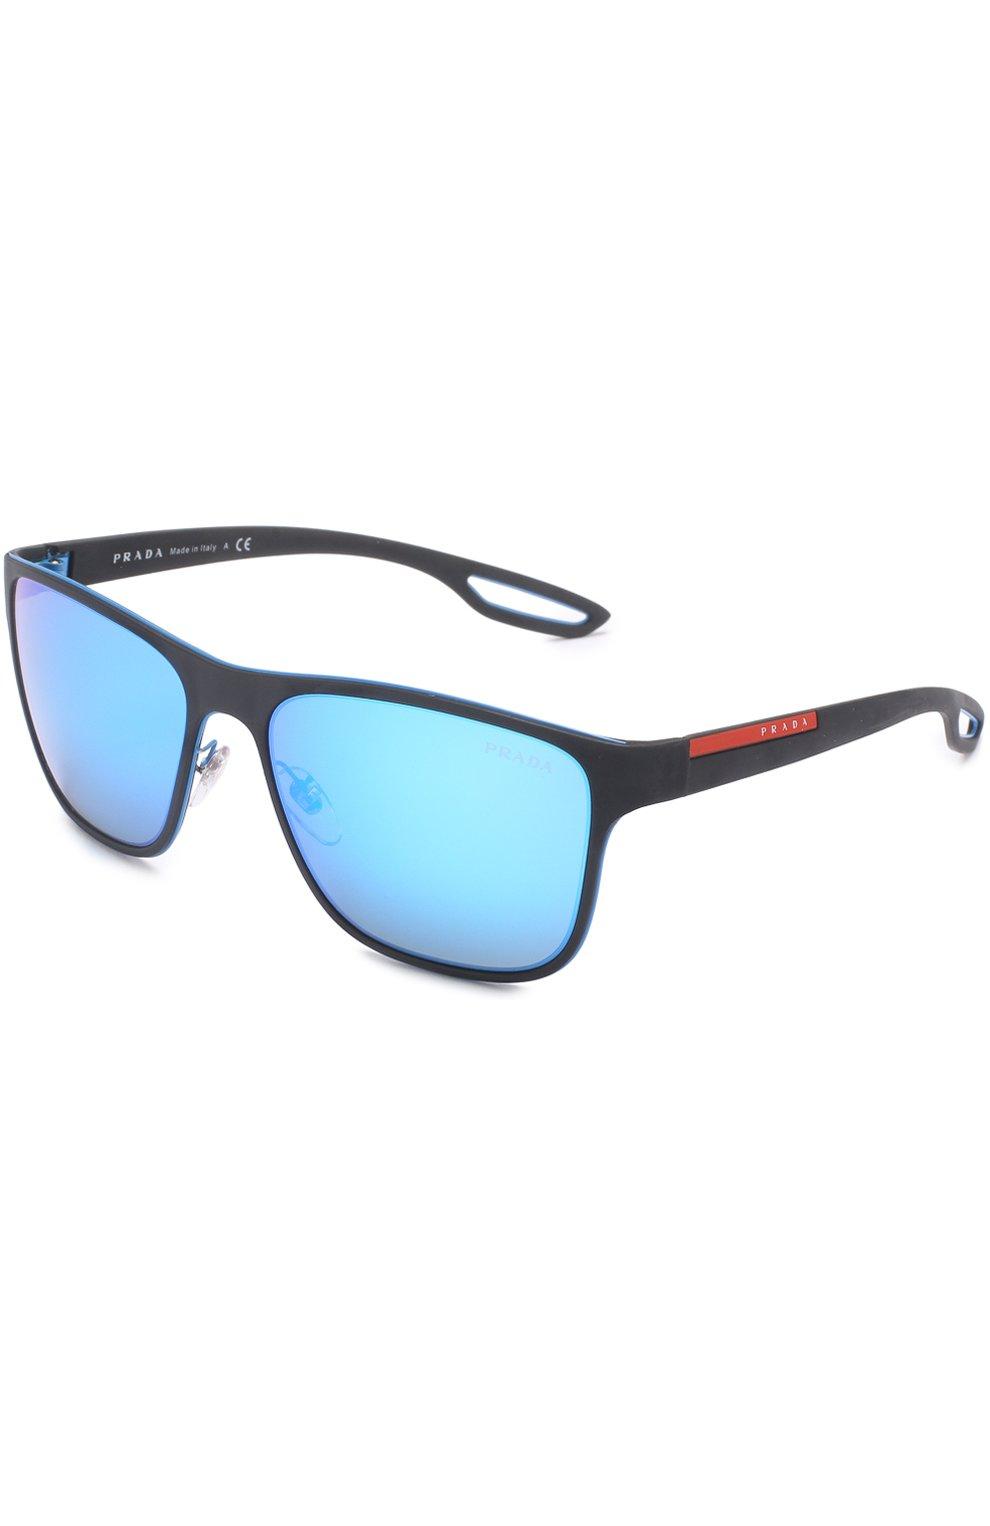 3d5740f4513e Фото Мужские синие солнцезащитные очки prada linea rossa PRADA Италия  00013821 56QS-VHK5M2